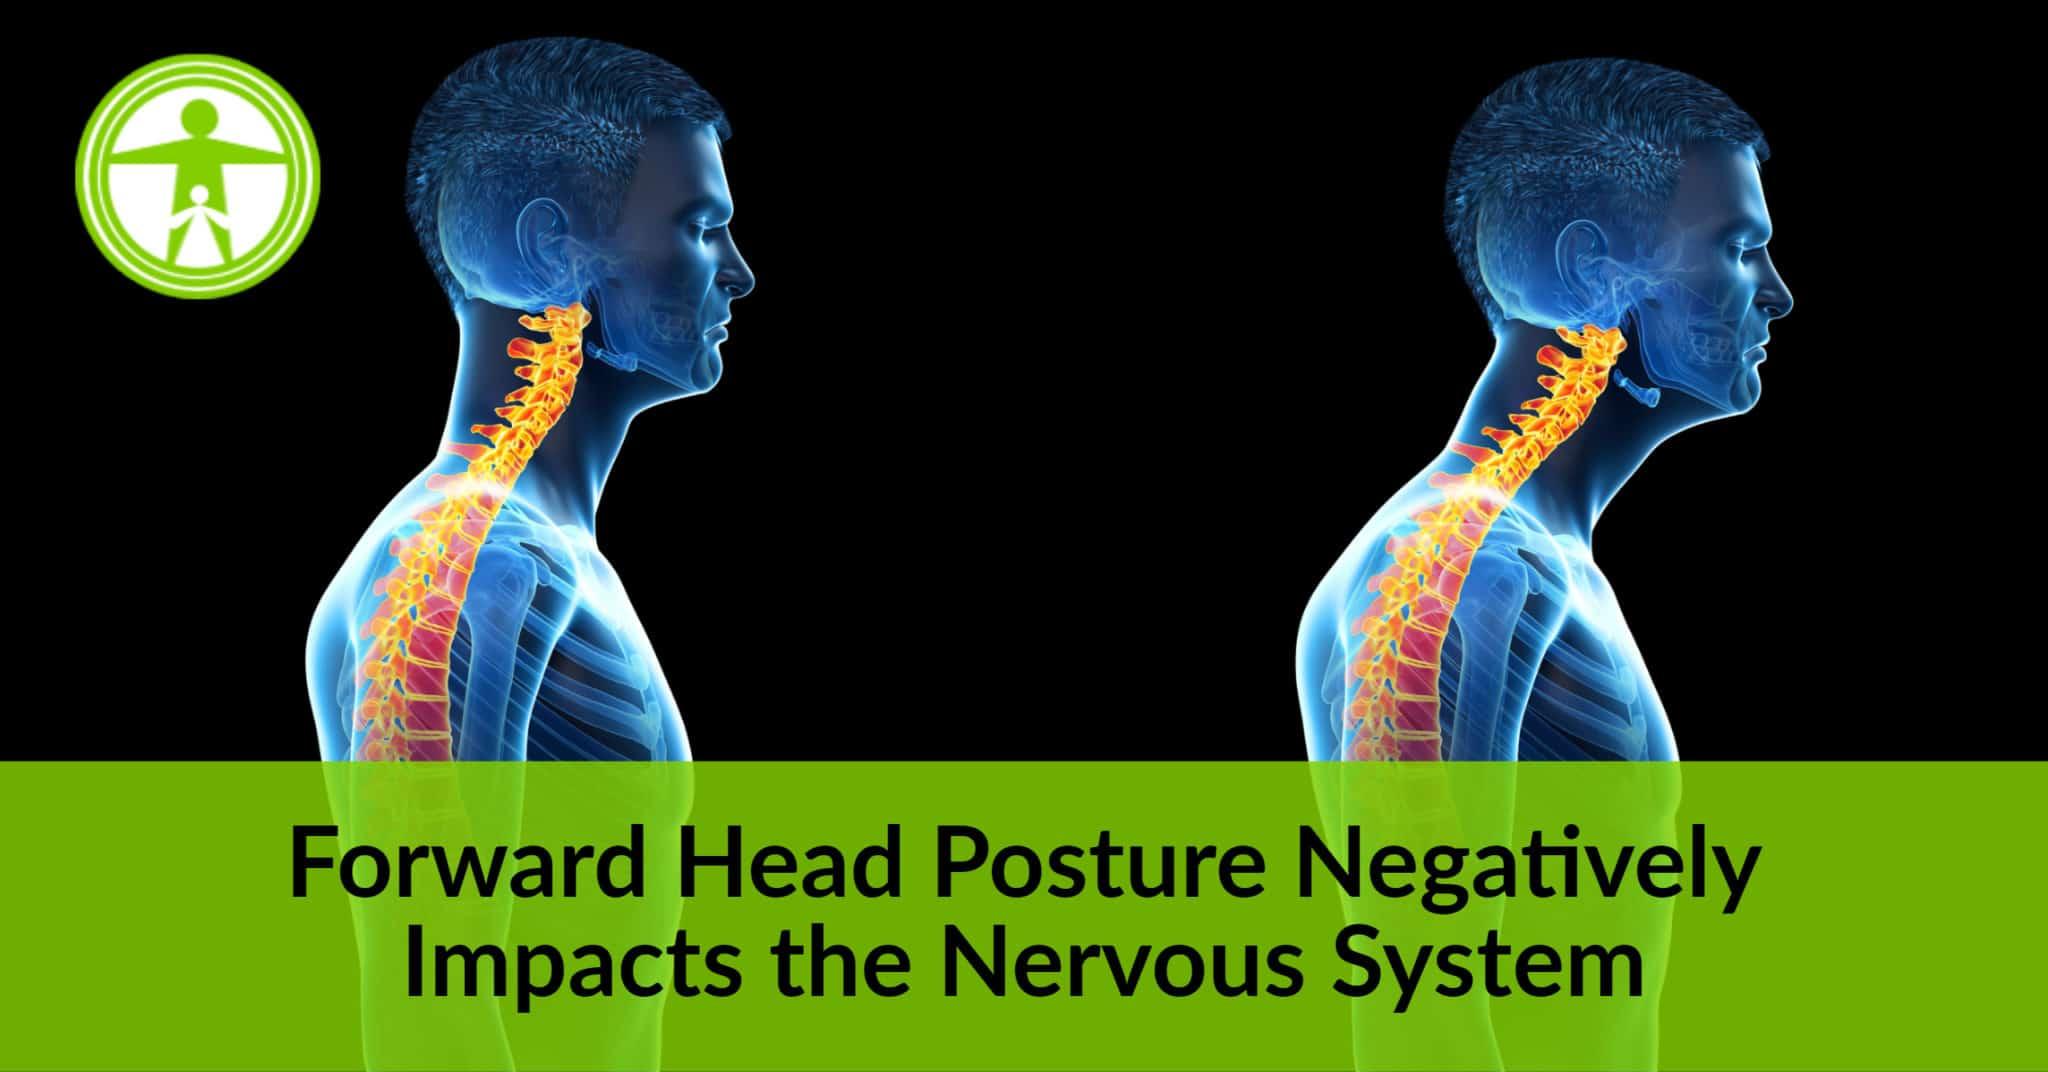 Forward Head Posture